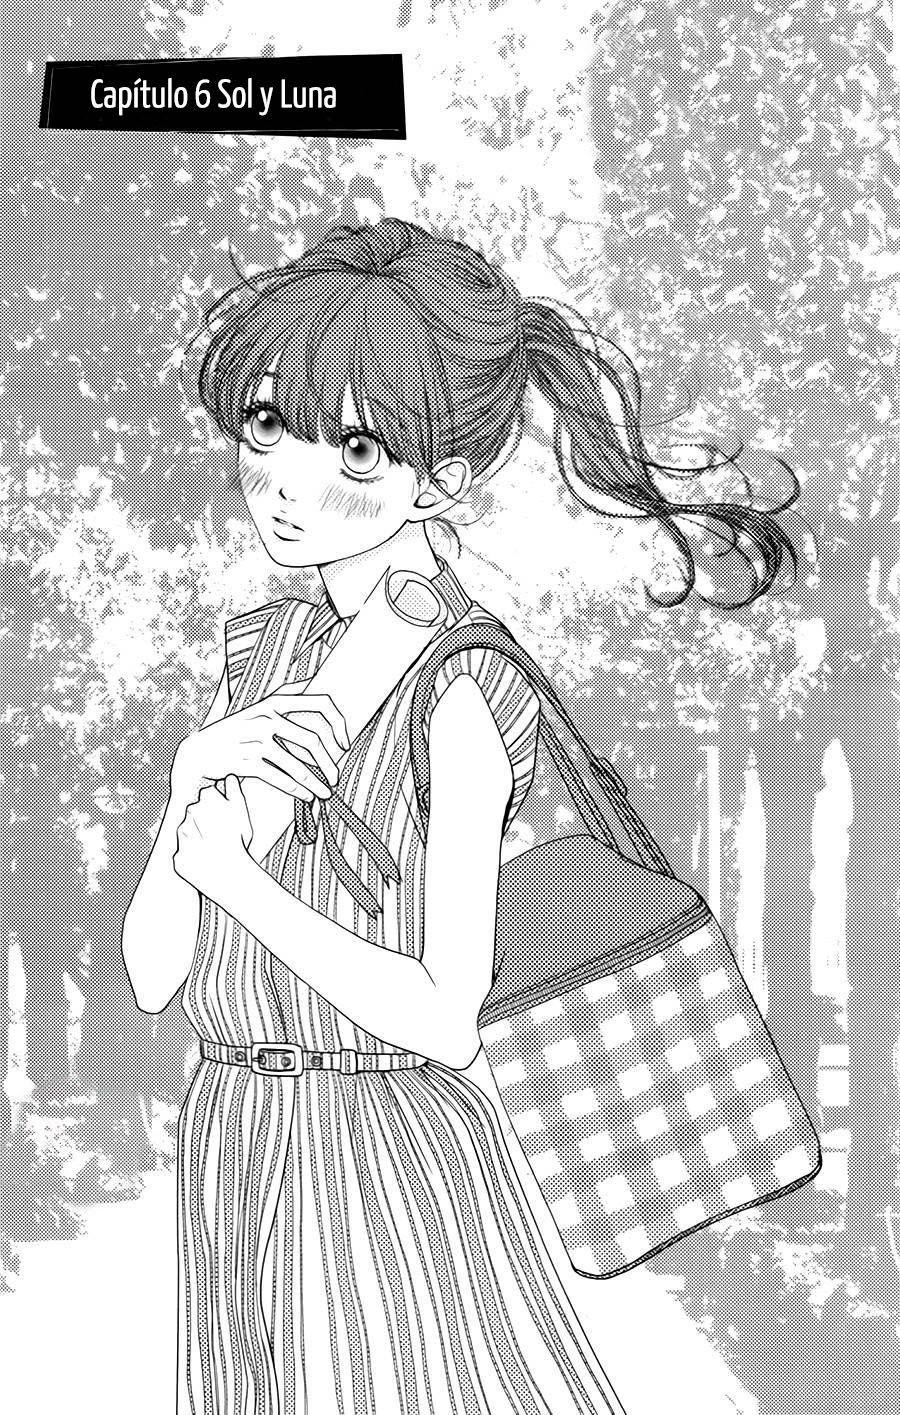 Kuchibiru ni Kimi no iro Capítulo 6 página 6 - Leer Manga en Español gratis en NineManga.com